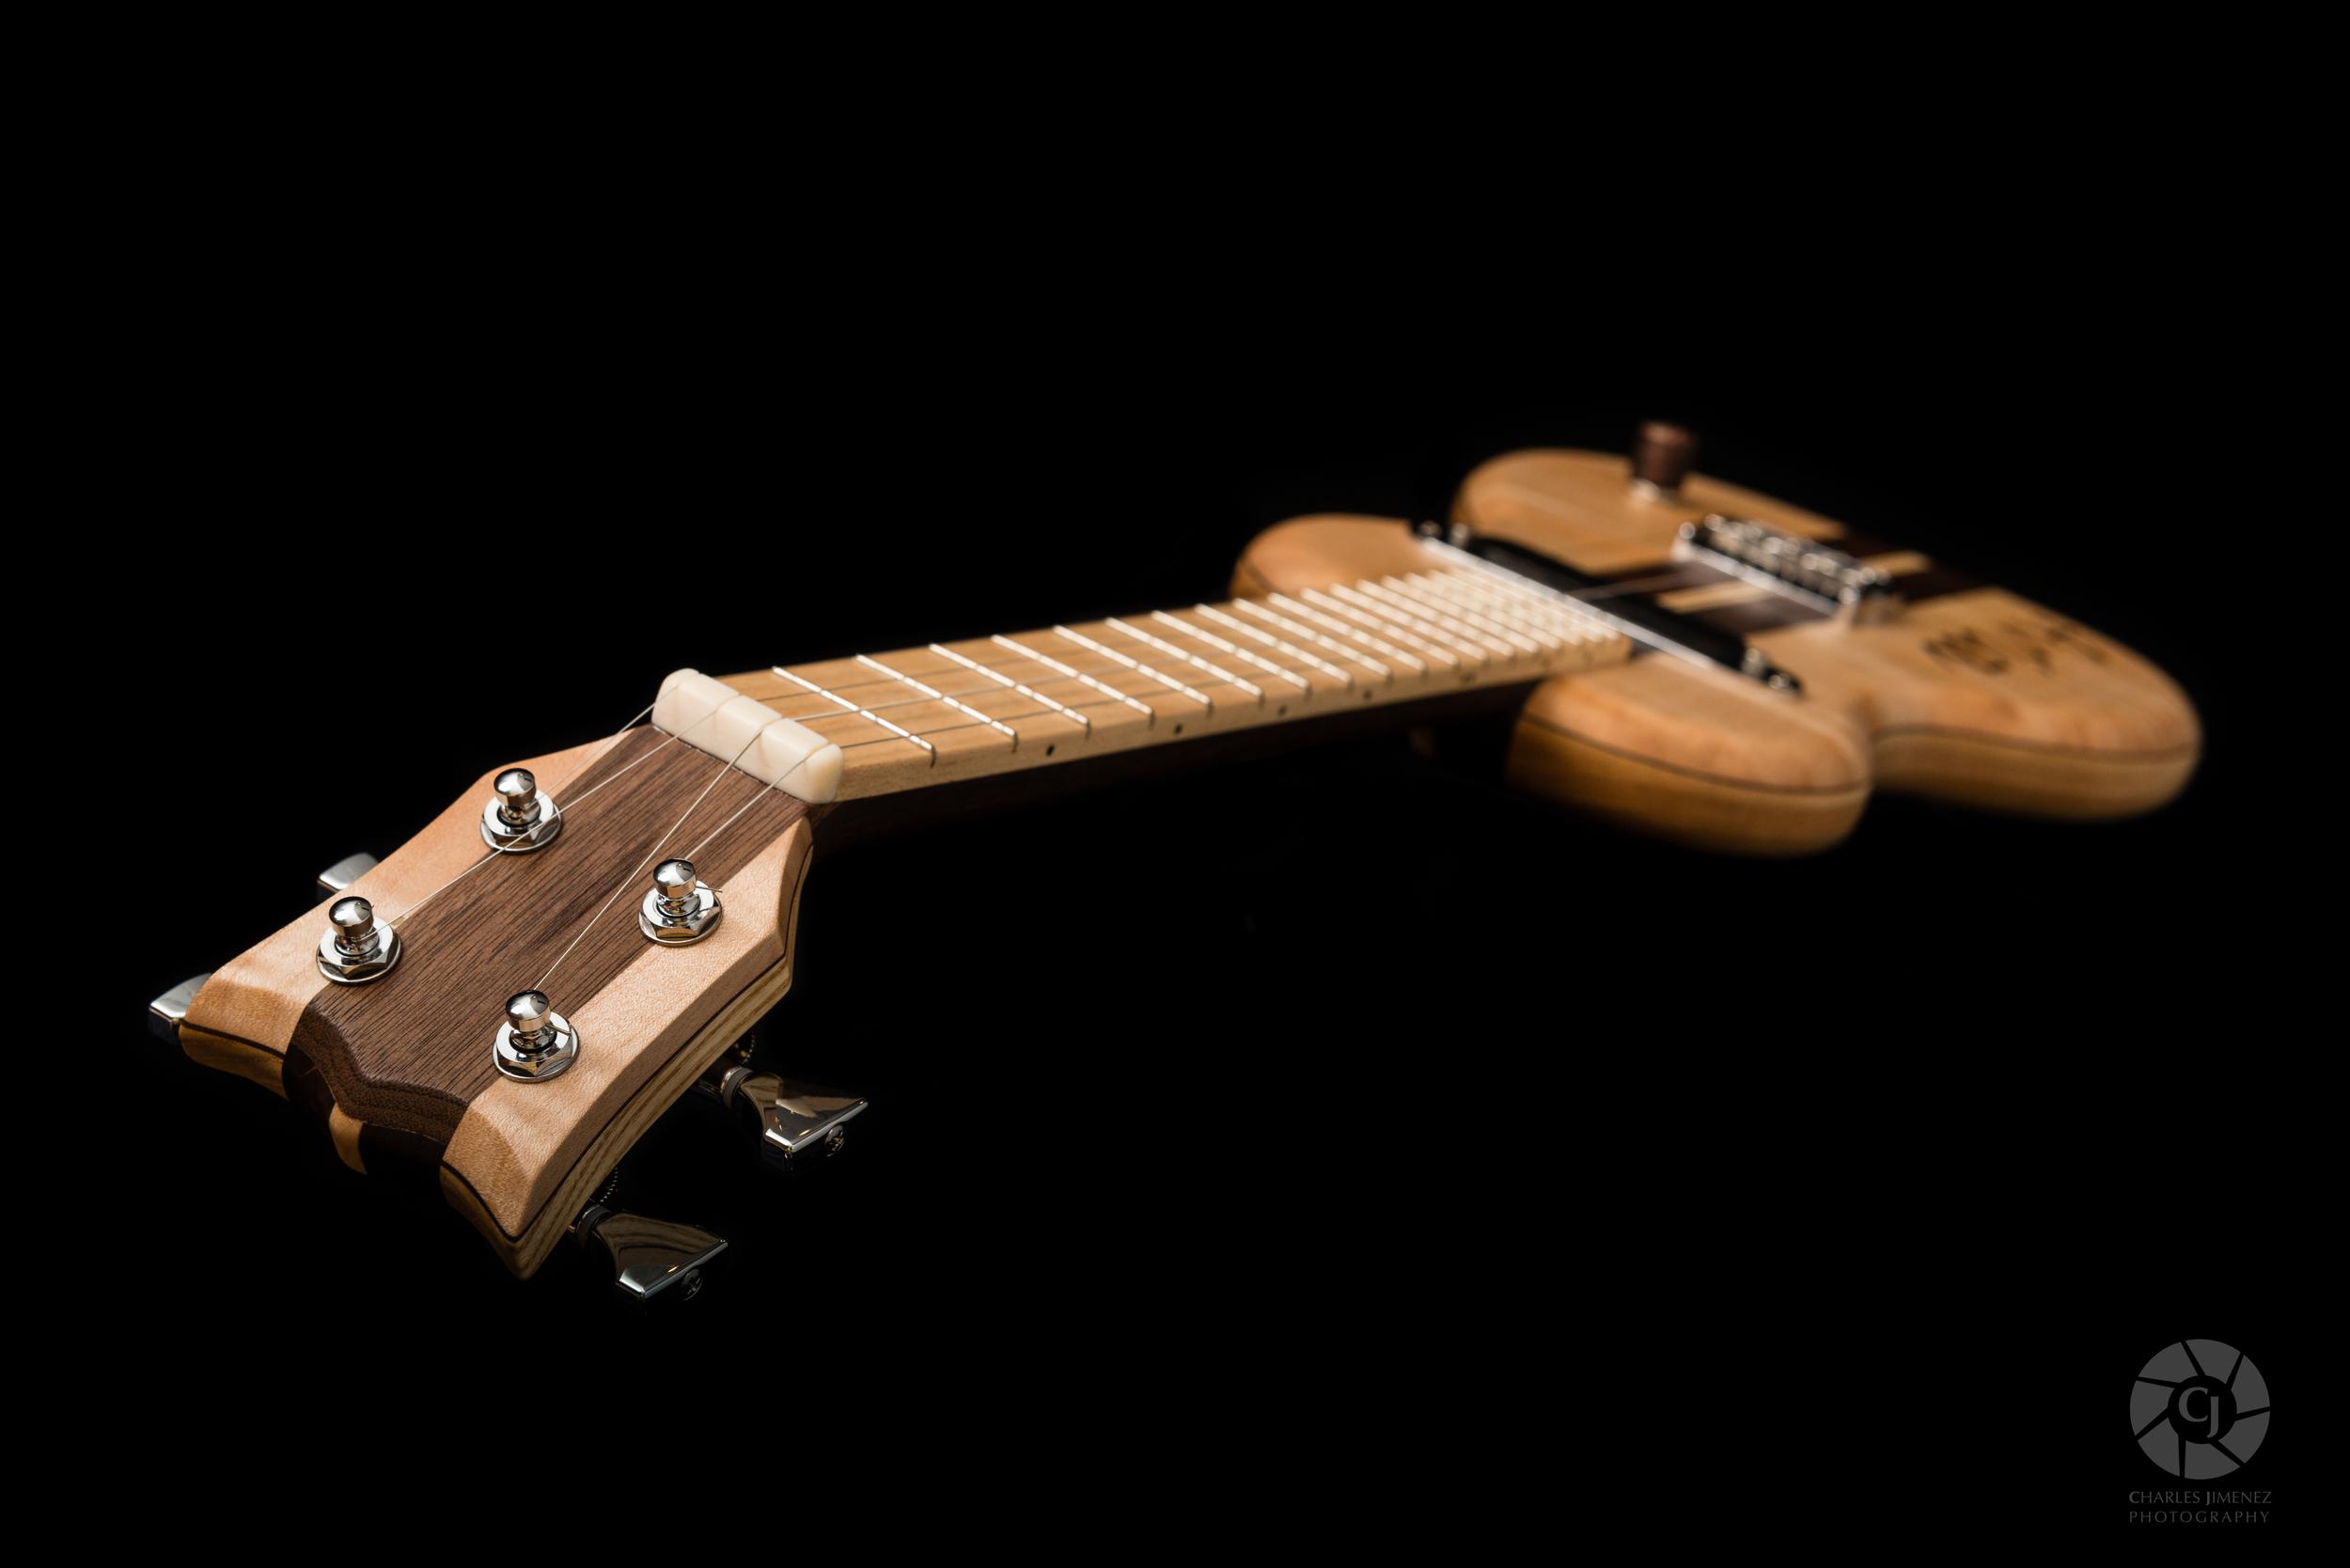 Better Mousetrap Guitars_Aria Ukulele_8-25-13_08.jpg